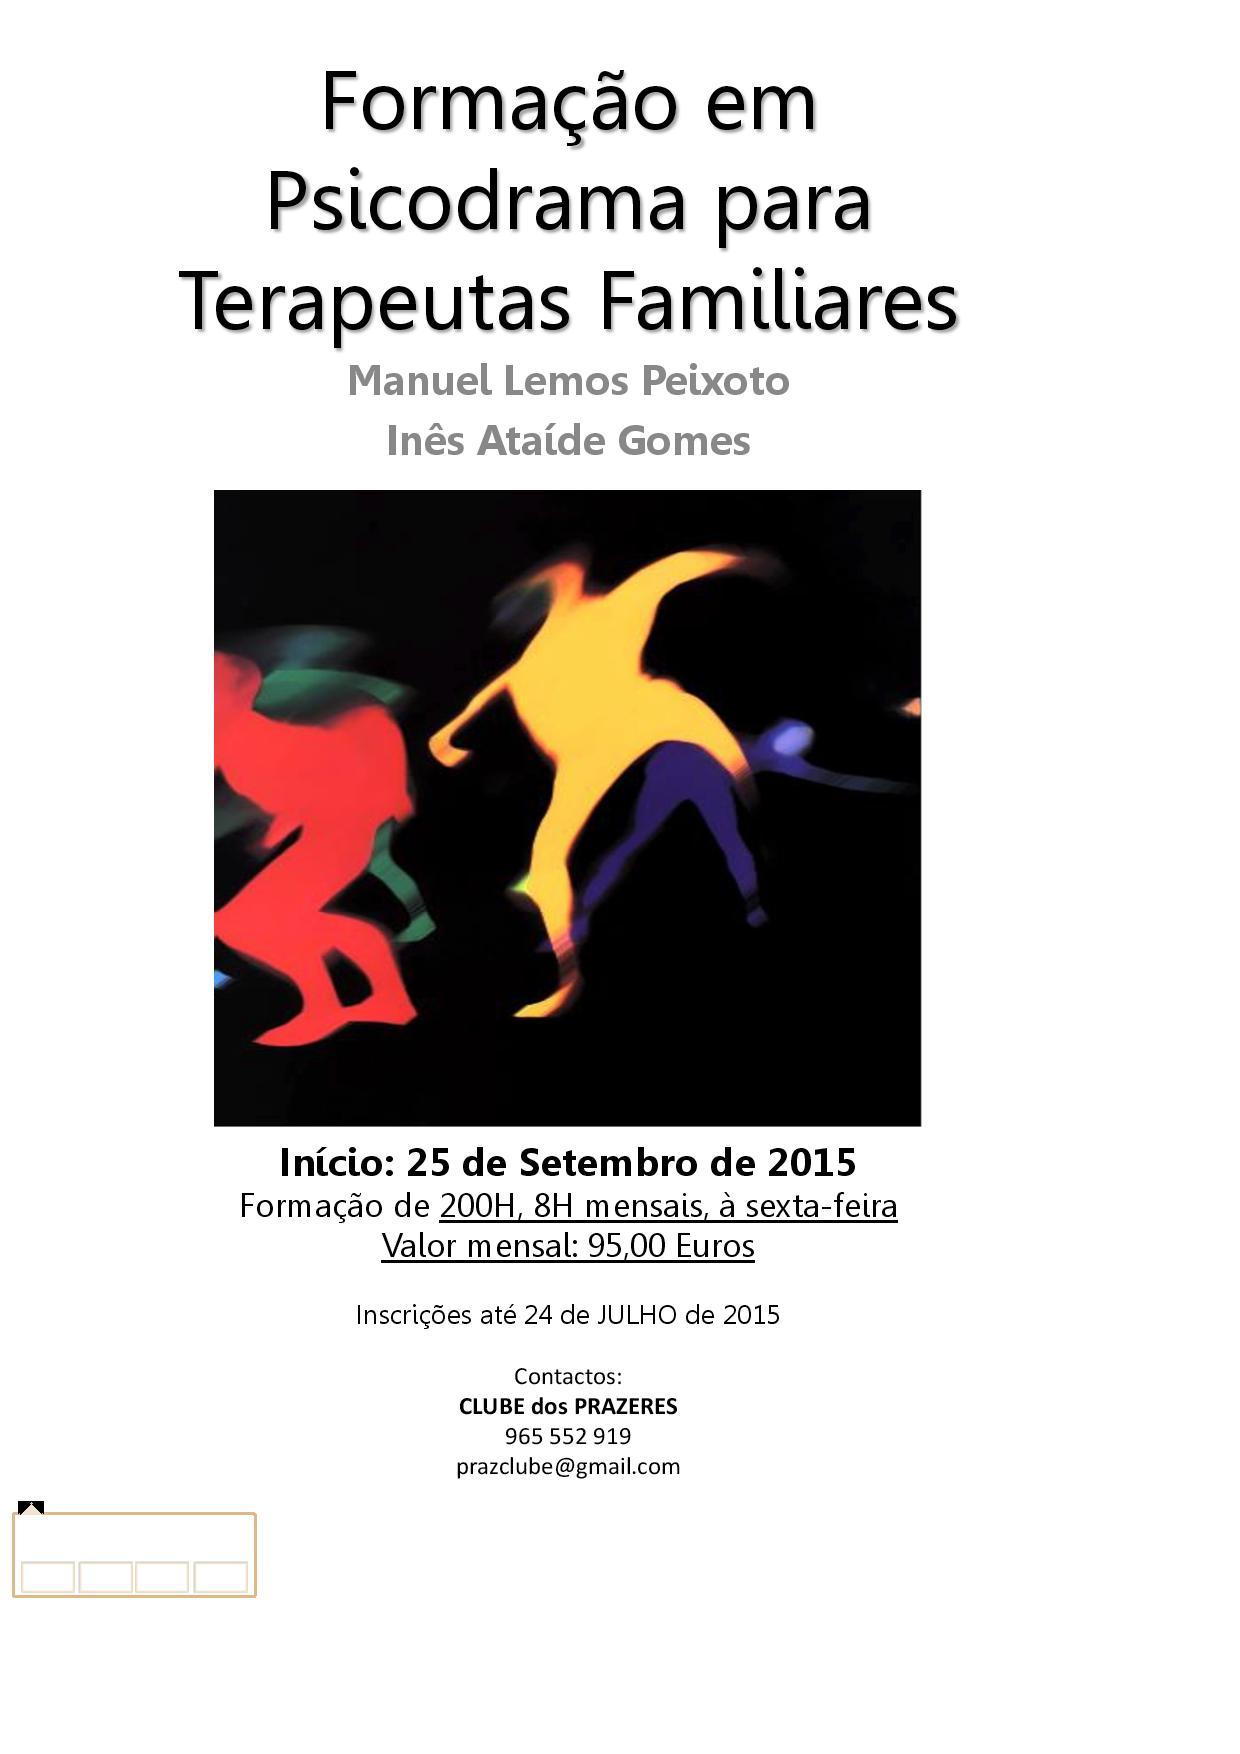 Psicodrama para Terapeutas Familiares 2015_16-page-001